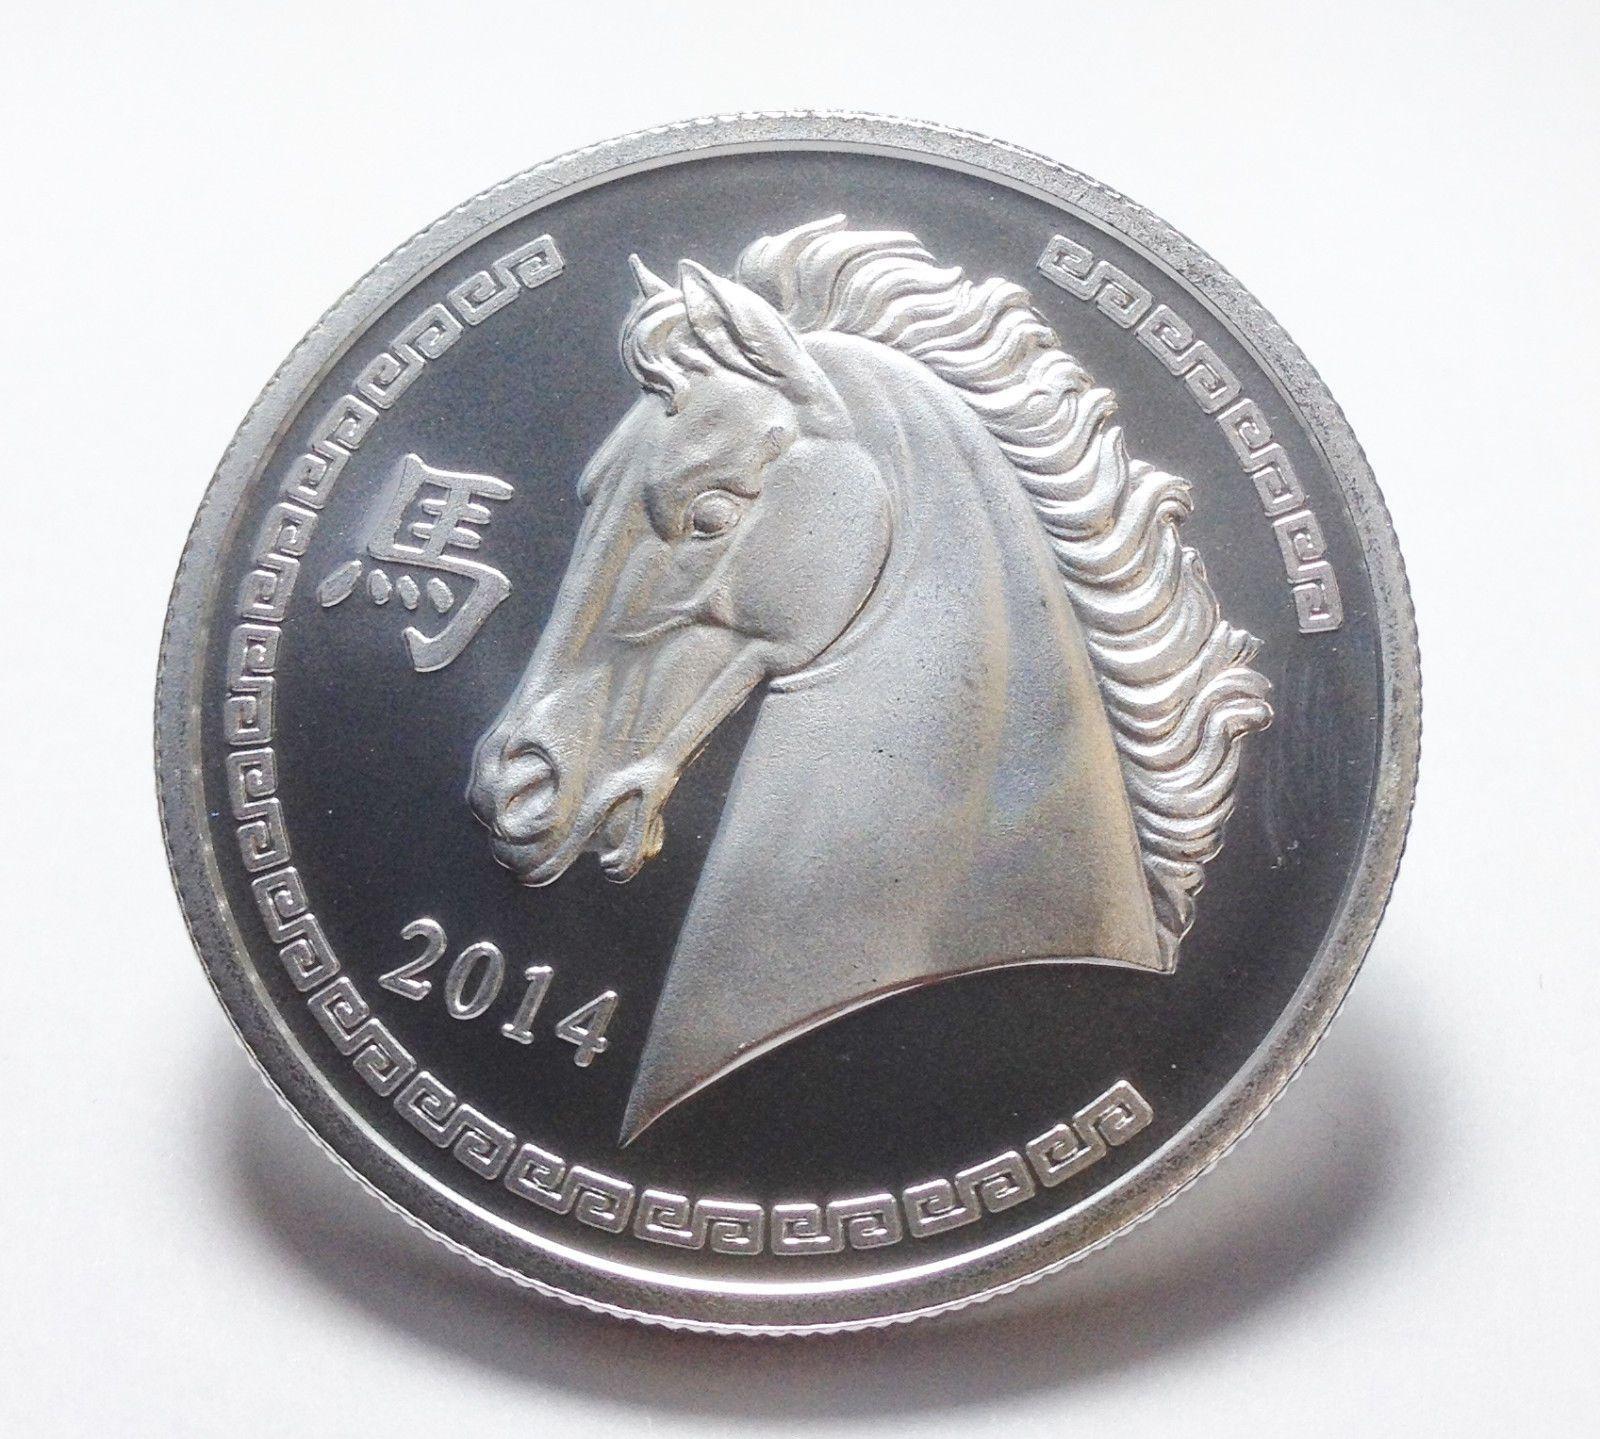 Roll Of 20 2014 Year Of The Horse 1 Oz Lunar Coin 999 Fine Silver Round Silver Bullion Bullion Coins